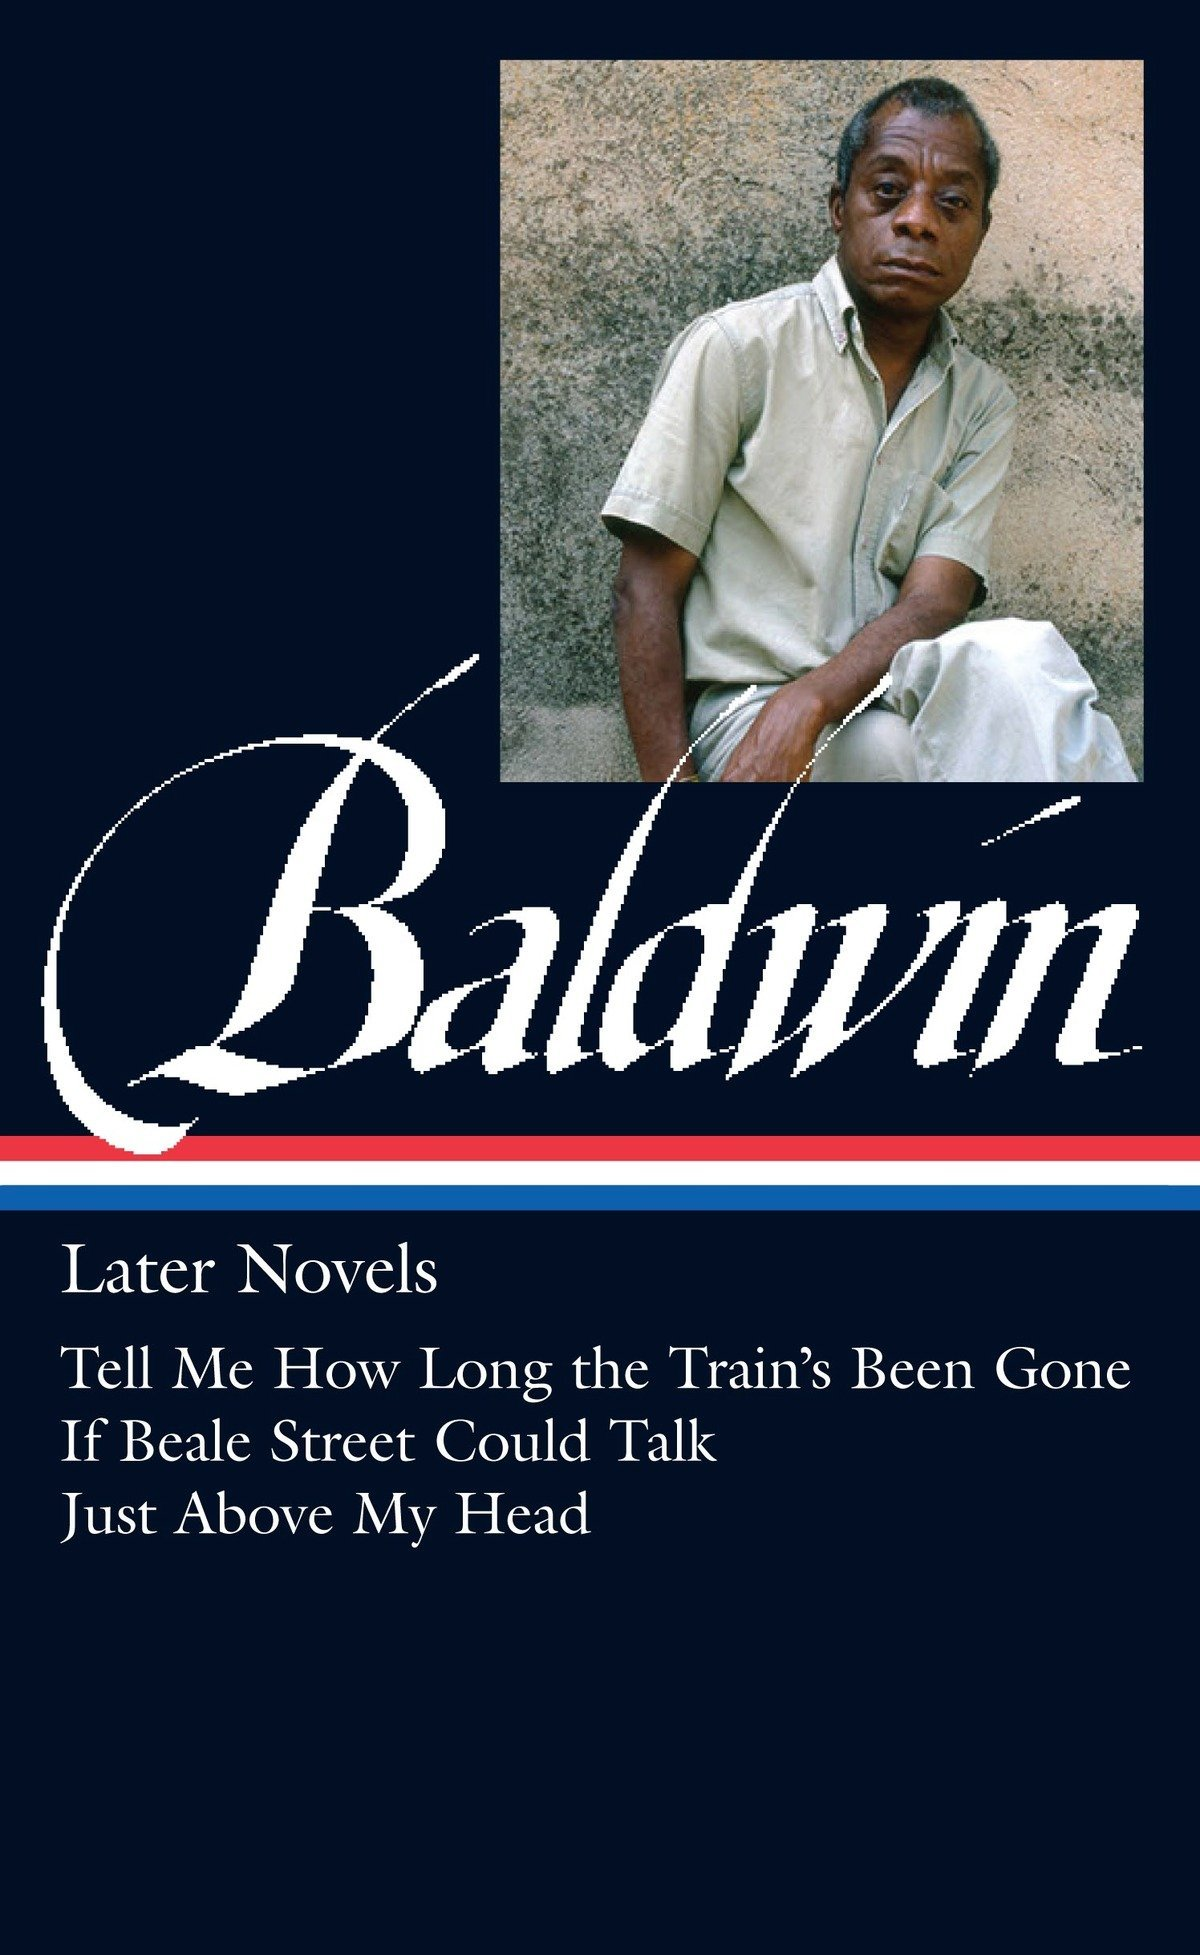 022 James Baldwin Collected Essays 81v0yxj44el Essay Wondrous Table Of Contents Ebook Google Books Full